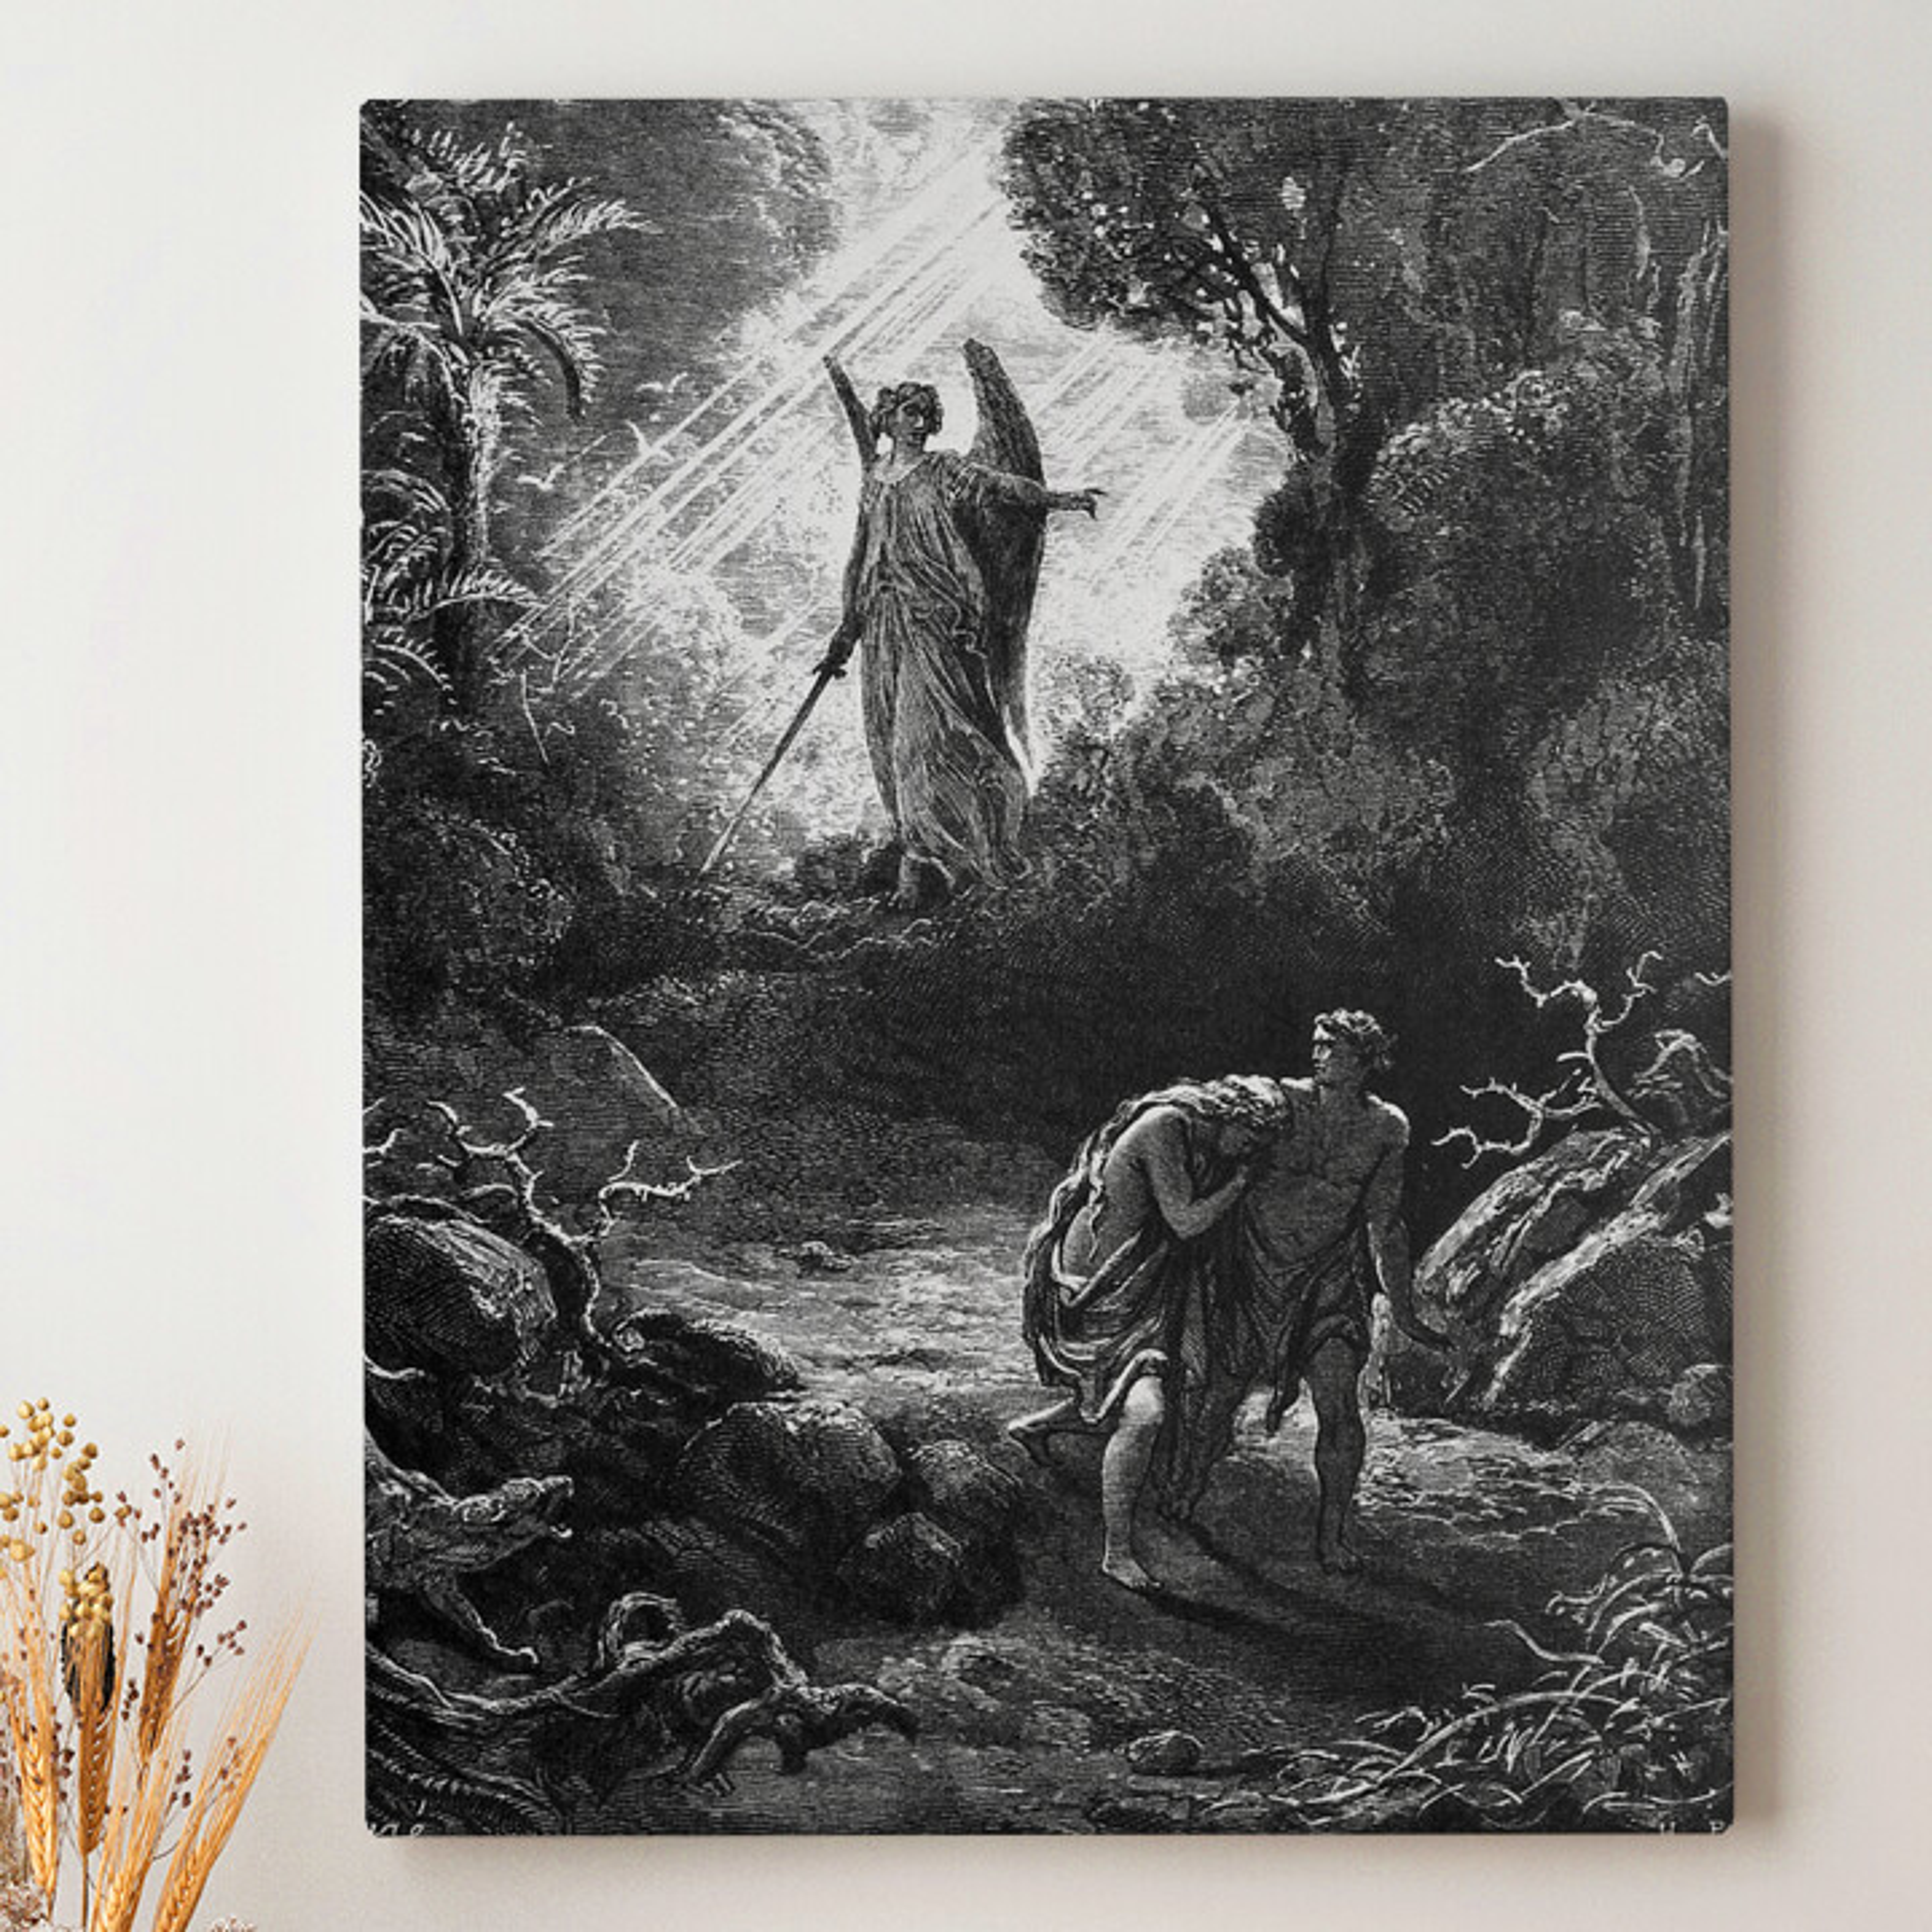 Leinwandbild personalisiert Adam und Eva im Paradies